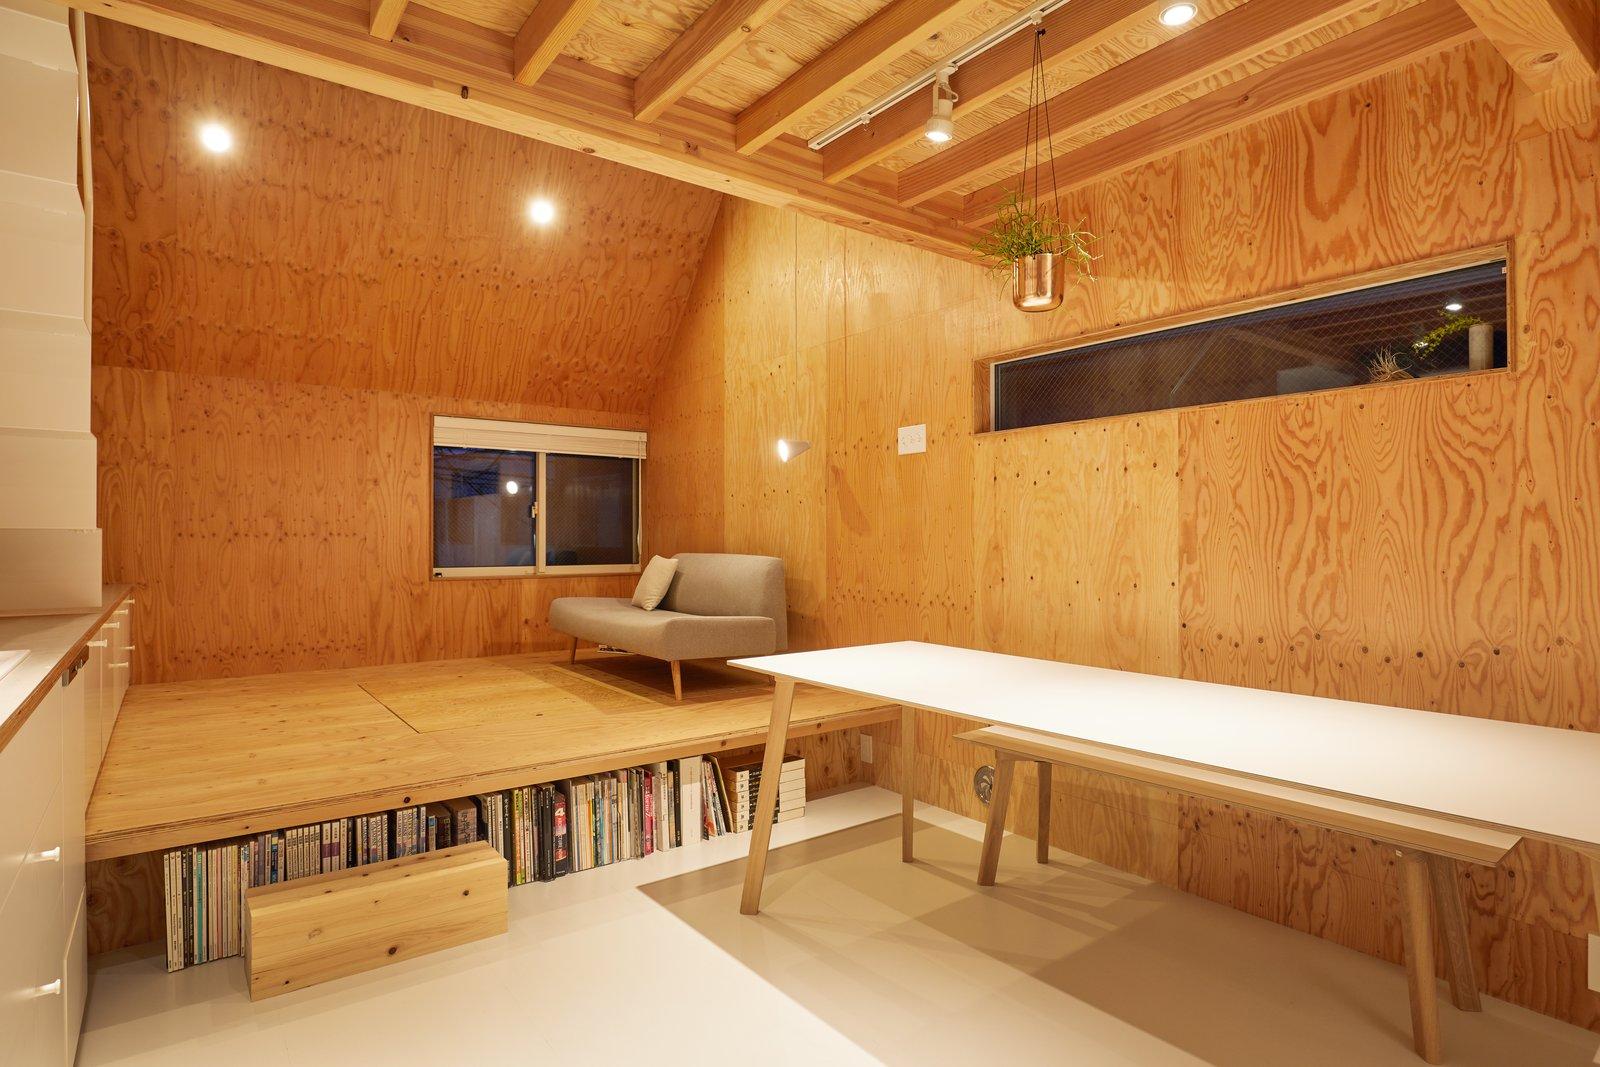 Milk Carton House Tenhachi Architect and Interior Design living room